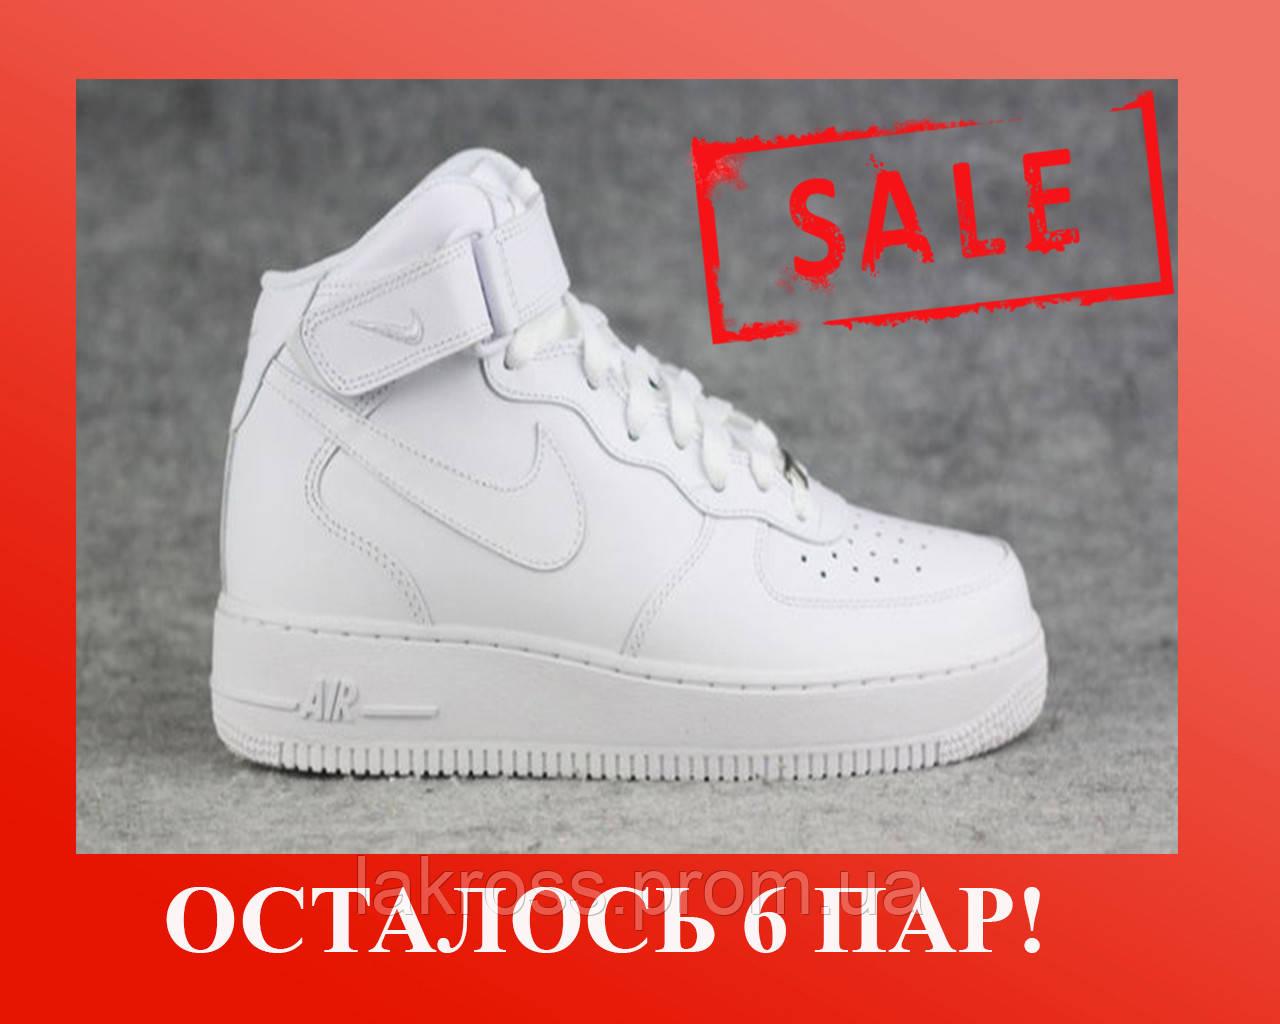 5d4d2a93 Кроссовки Nike Air Force High White (БЕЛЫЕ) СКИДКА -60% — в ...